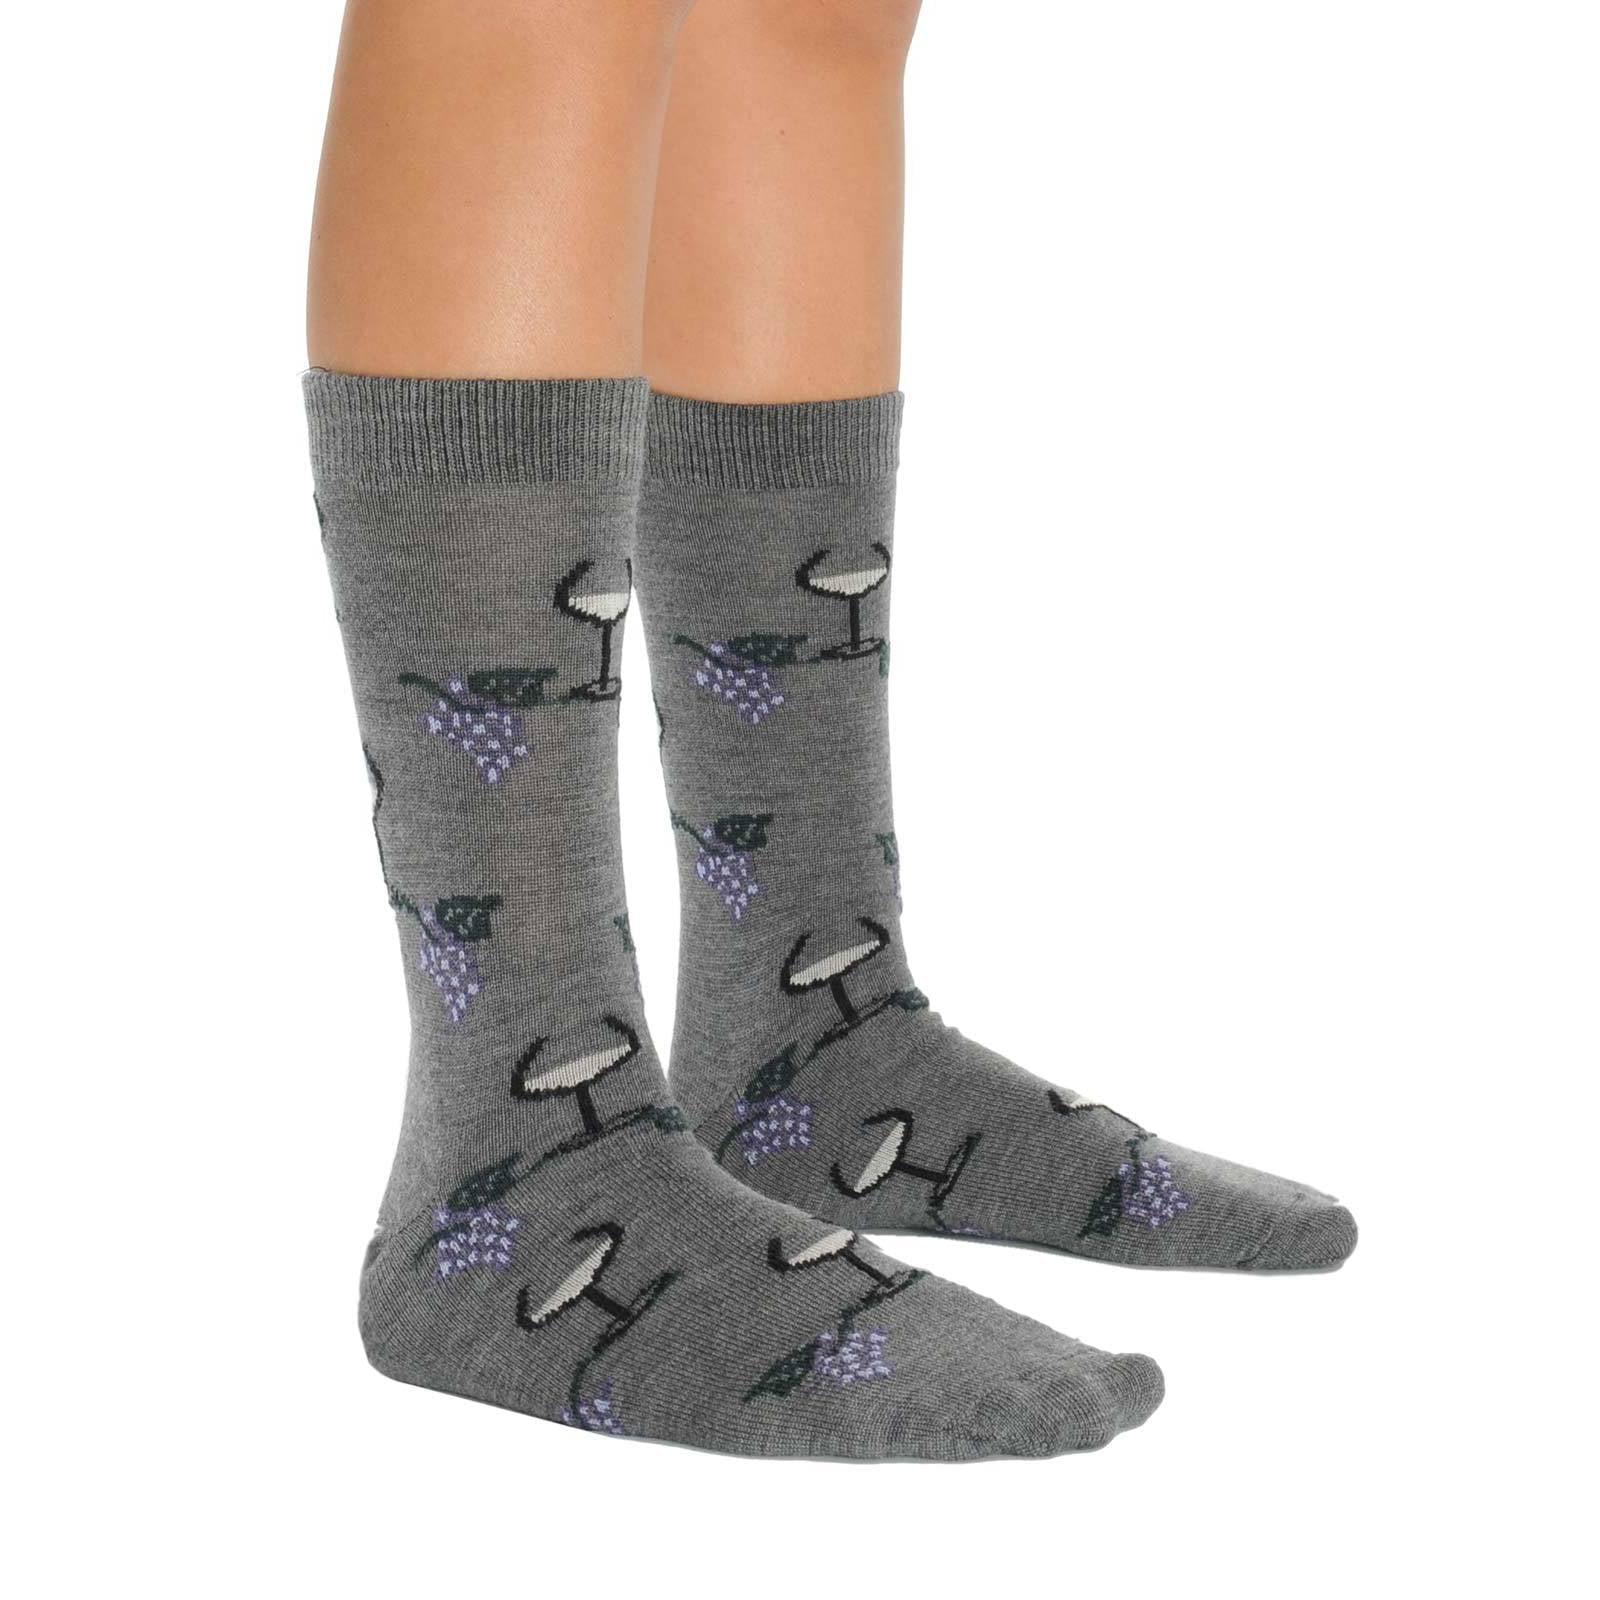 Mens Comfortable Merino Wool Socks Wine Glass and Grape Design 3 Color Options by Wool Socks